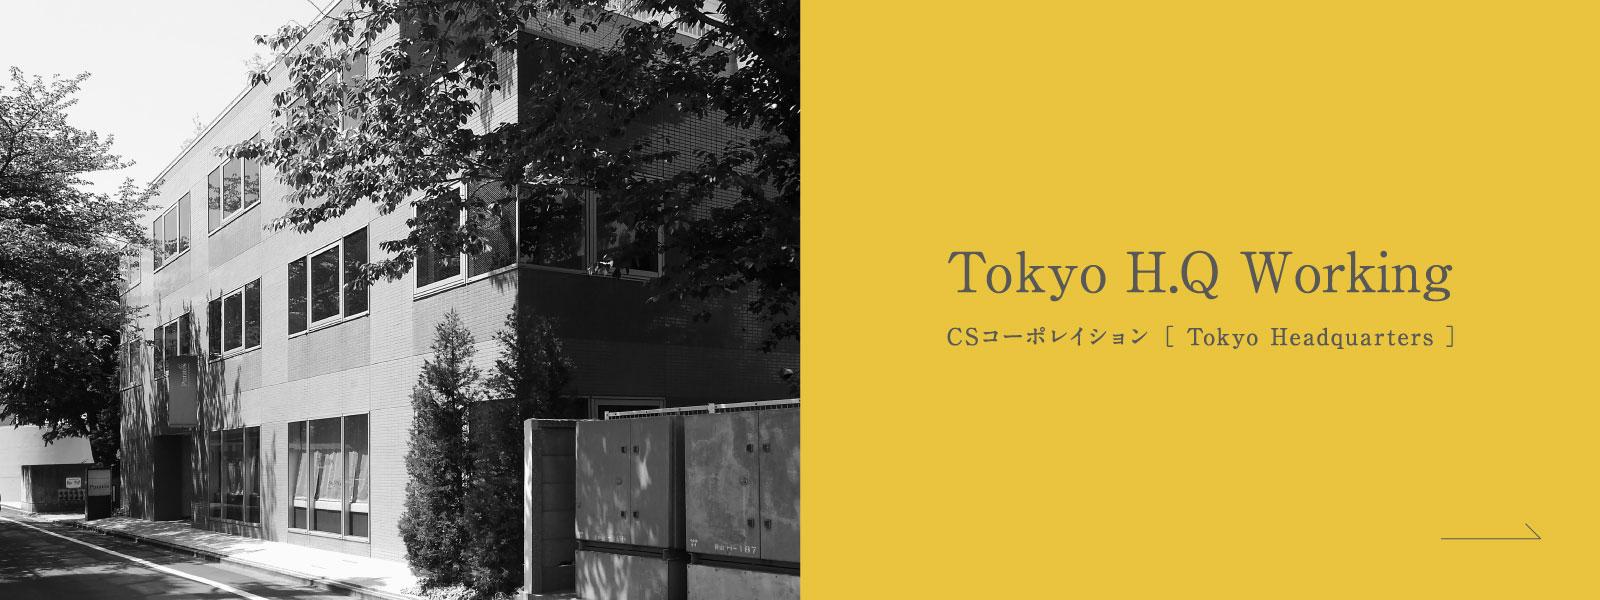 CSコーポレイション [ Tokyo Headquarters ] 開設のお知らせ